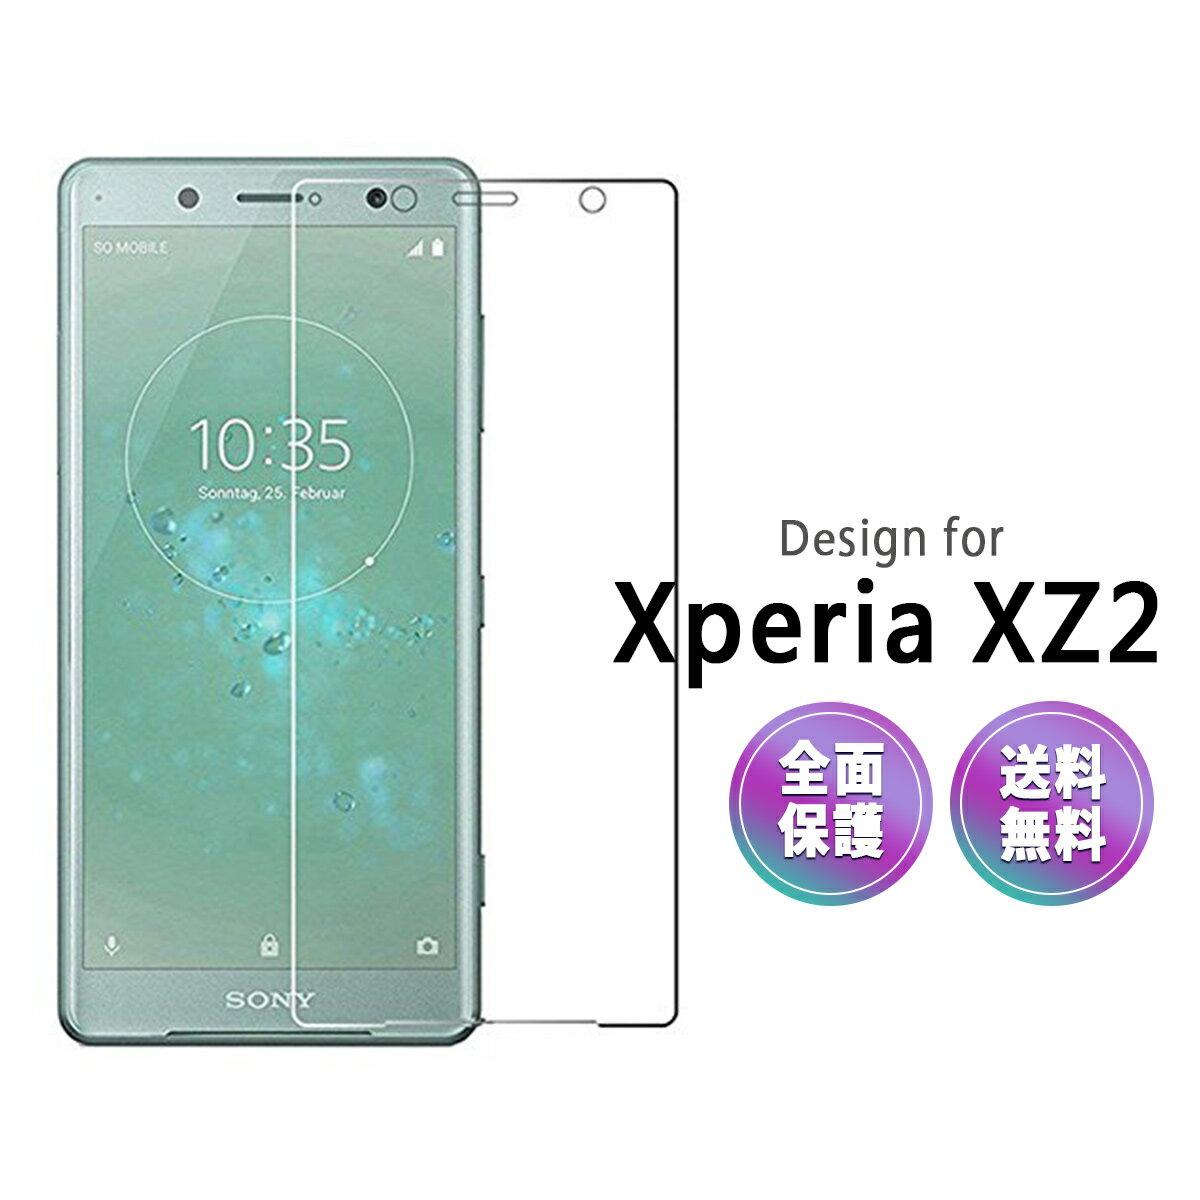 Xperia XZ2 Compact ガラスフィルム 全面 保護 docomo SO-05K エクスペリア XZ 2 コンパクト 液晶 画面 滑らか 3D 感度良好 硬度 9H CLEAR クリア【送料無料】ポイント消化